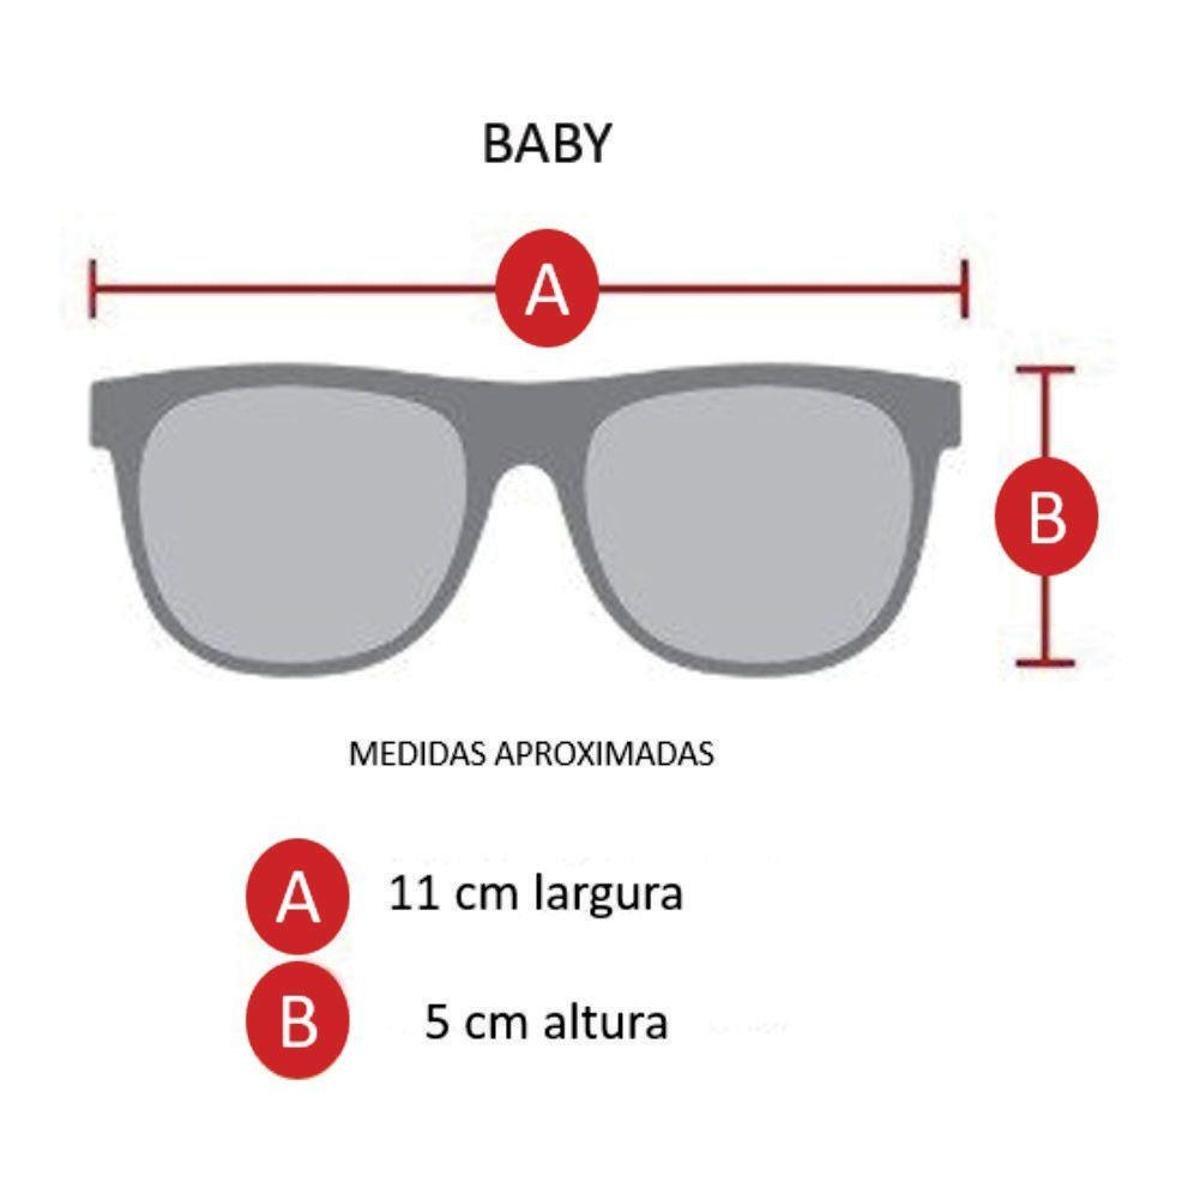 d3caa7c780d20 Óculos de Sol Khatto Baby Round Kids Masculino - Rosa - Compre Agora ...